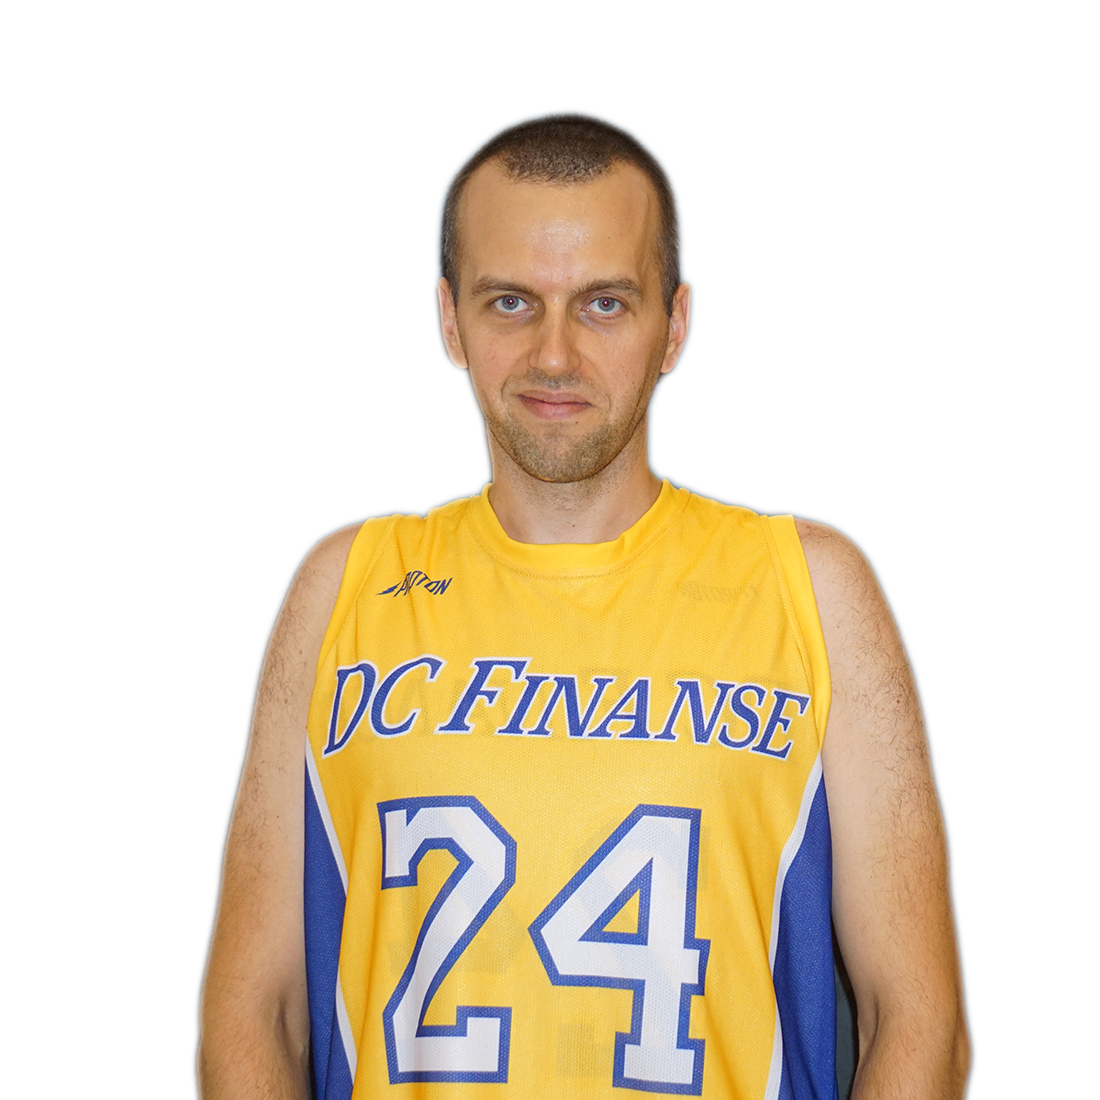 Dawid Laskowski